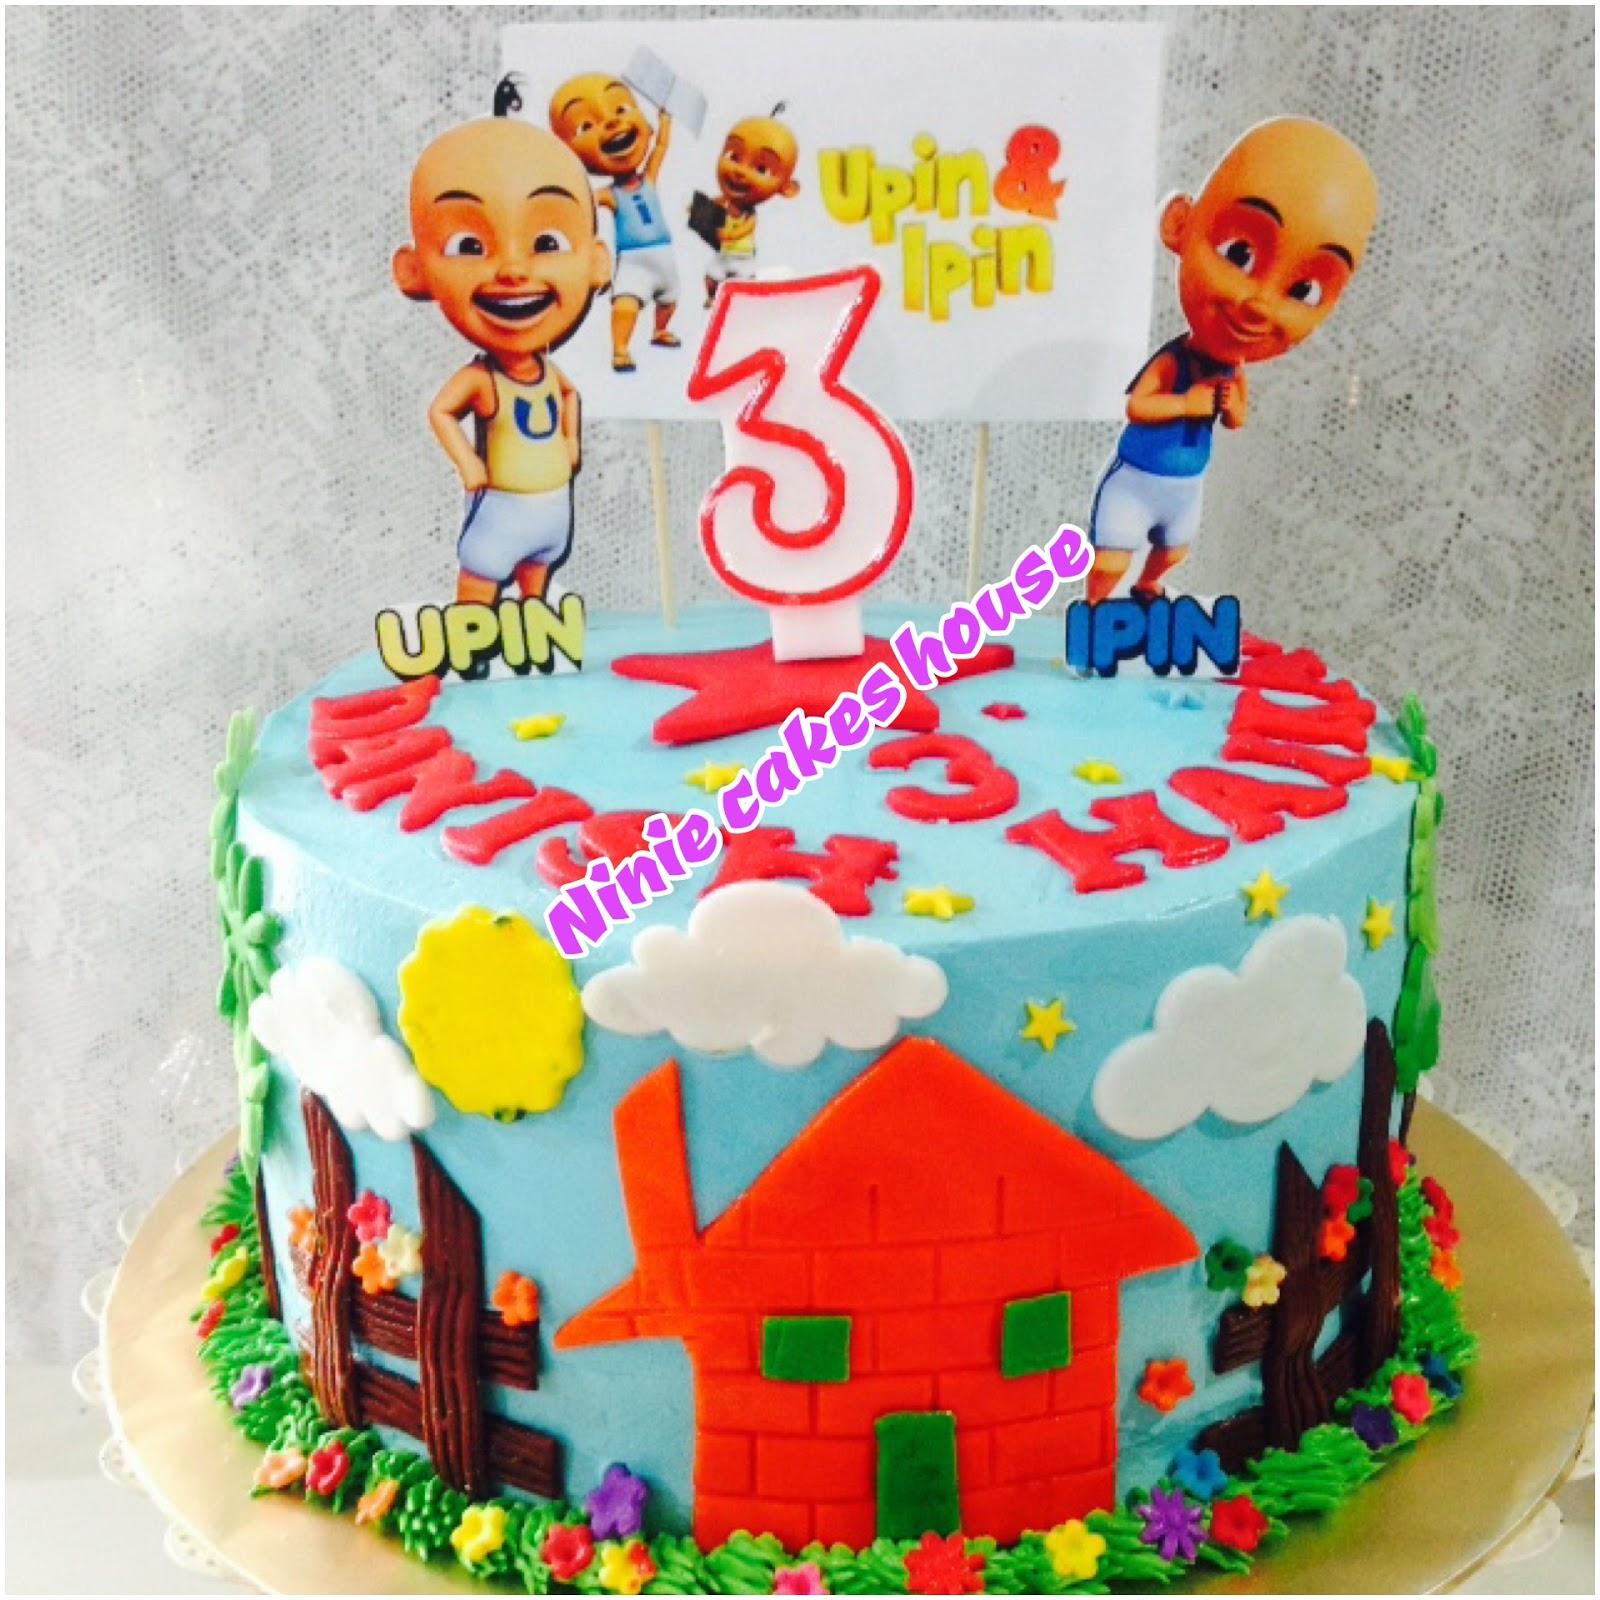 Ninie Cakes House: Upin & Ipin Fondant Birthday Cake